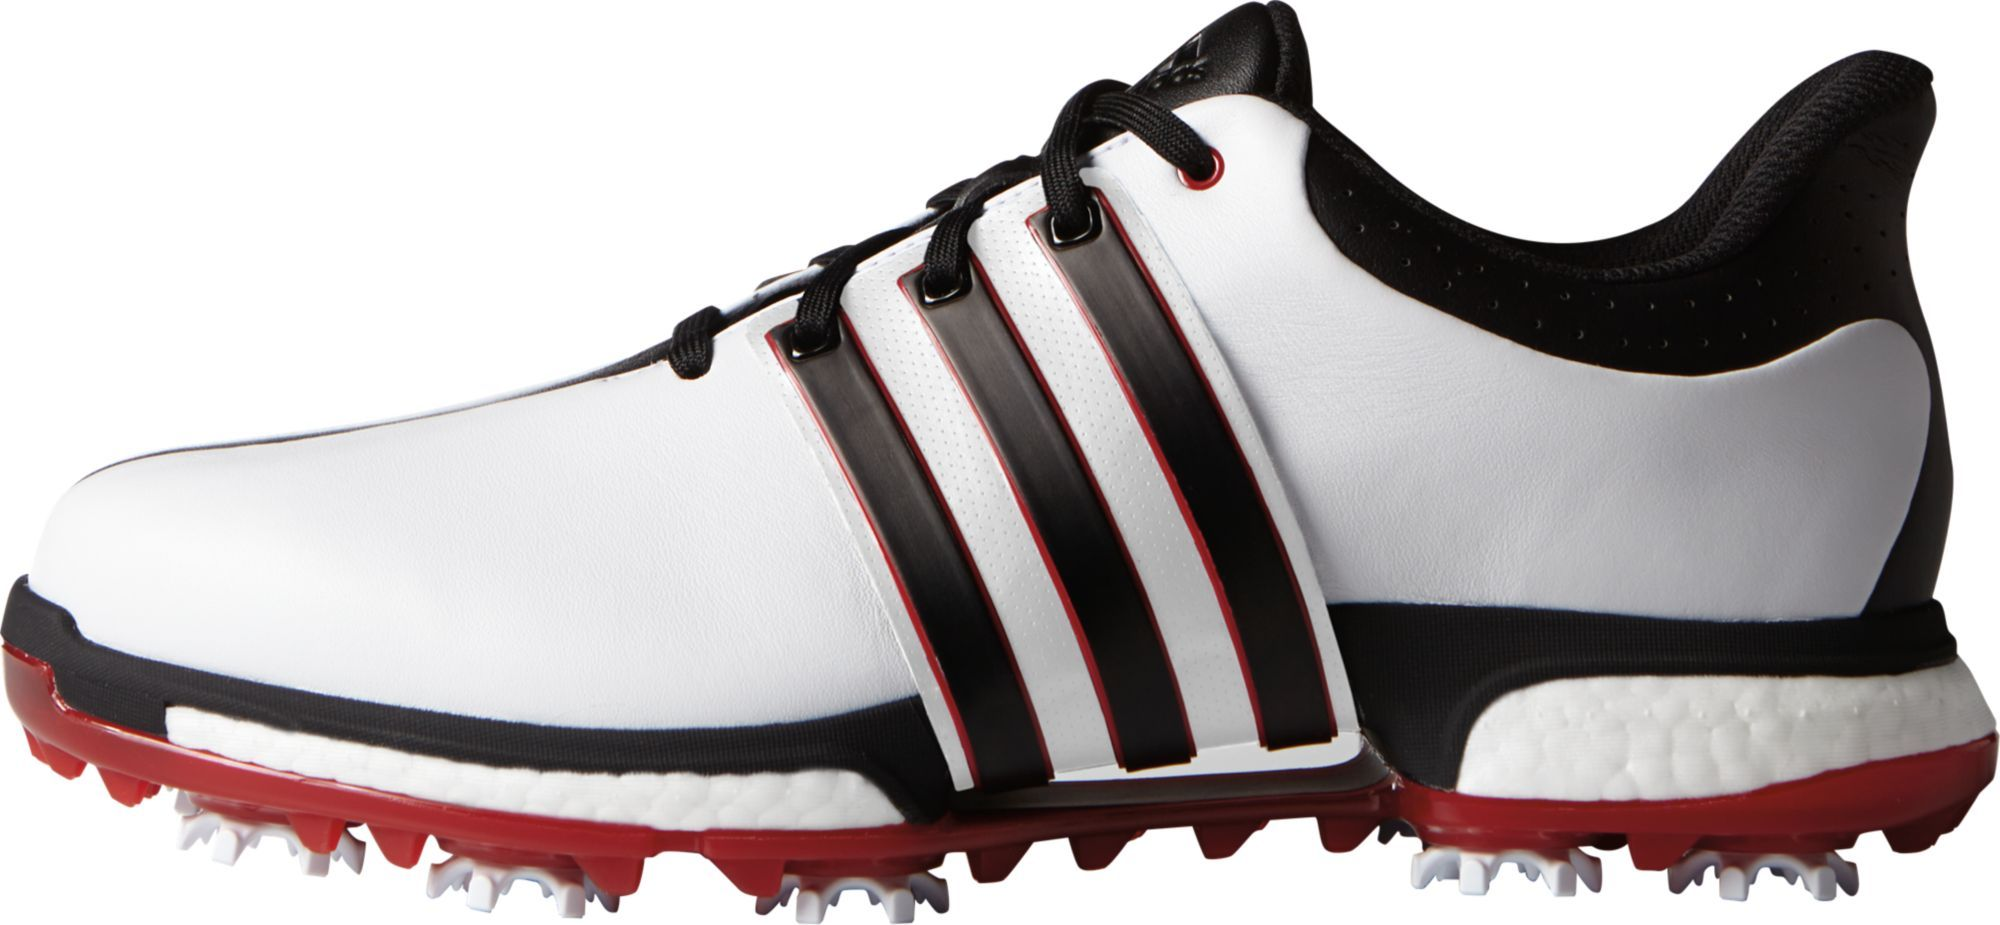 adidas Tour360 BOOST Golf Shoes | Golf Galaxy